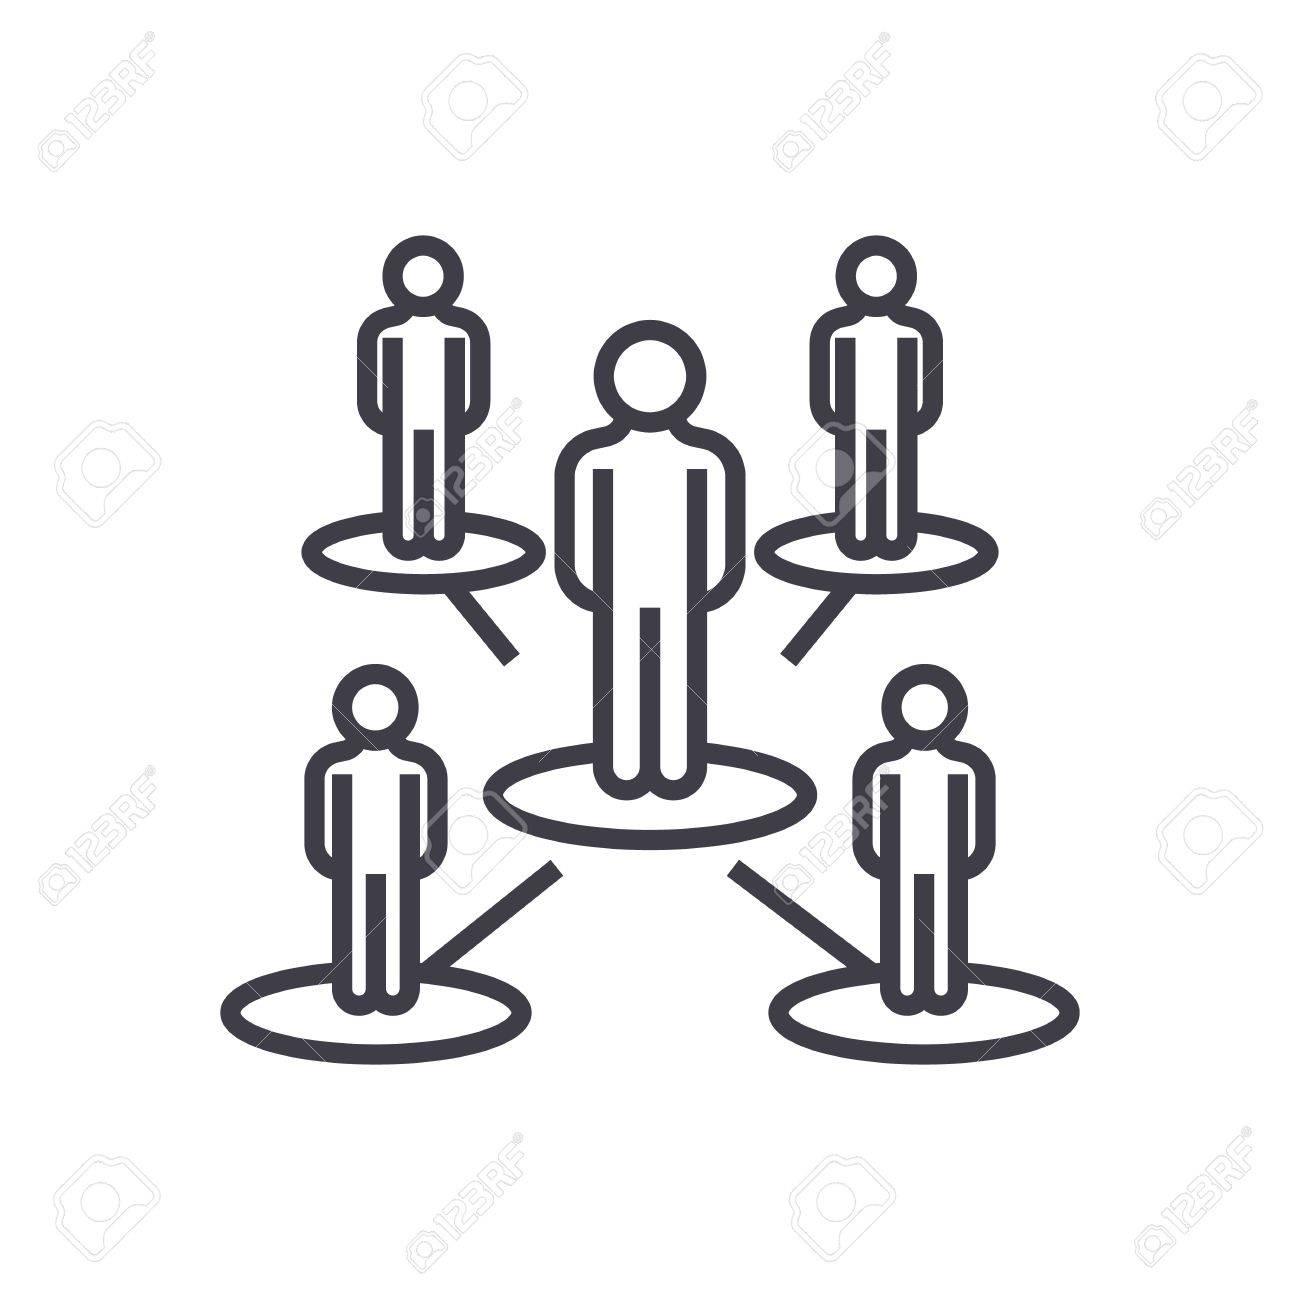 Leadership Networkmultilevel Marketingmlm Vector Line Icon Sign Illustration On White